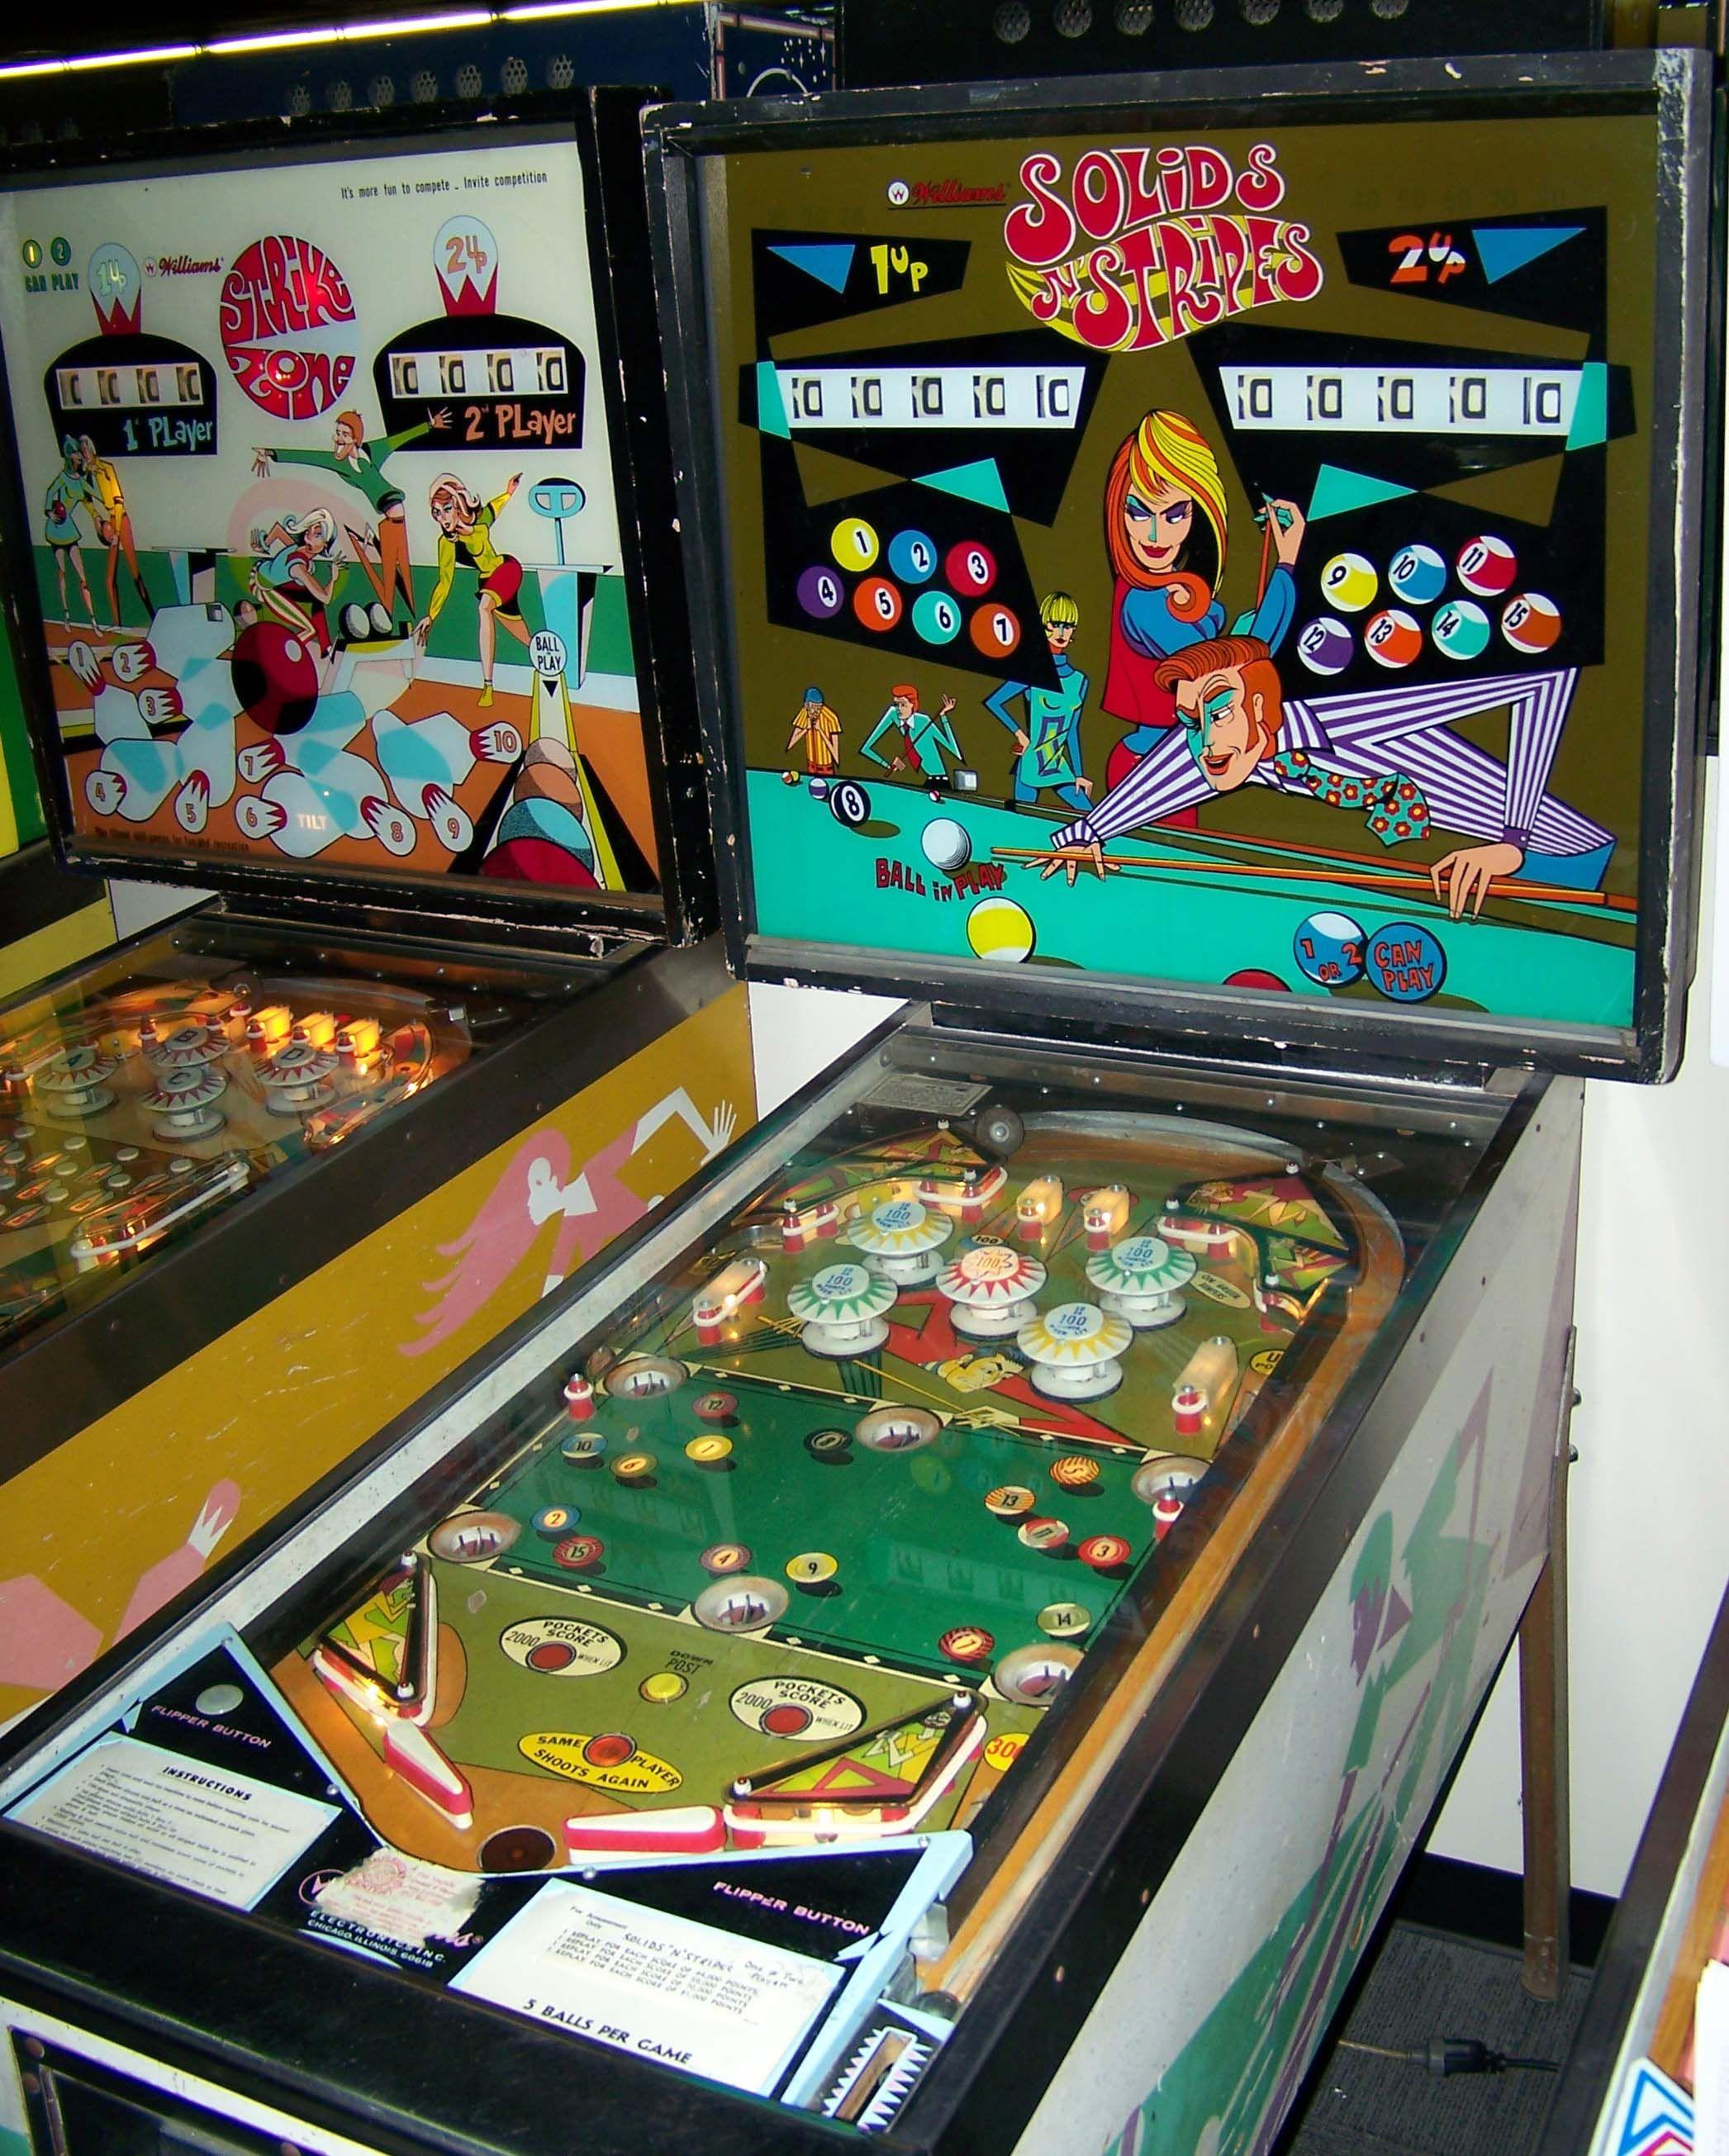 1971 Solids N Stripes Williams Pinball Machine Pinballs De Los Anos 30 A Los 70